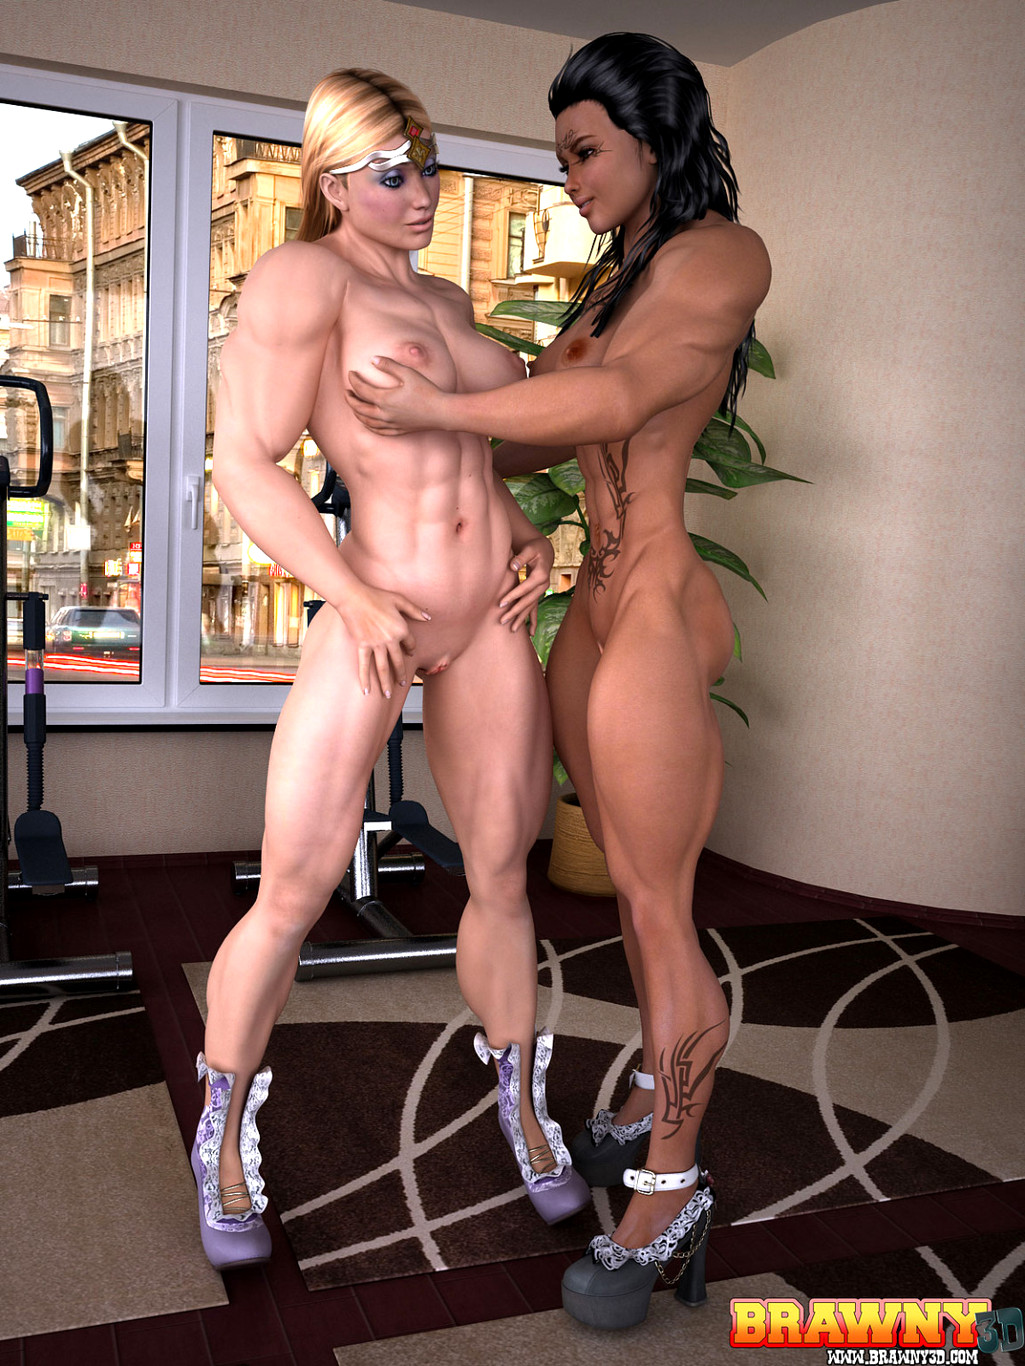 Muscular lesbian porn stars